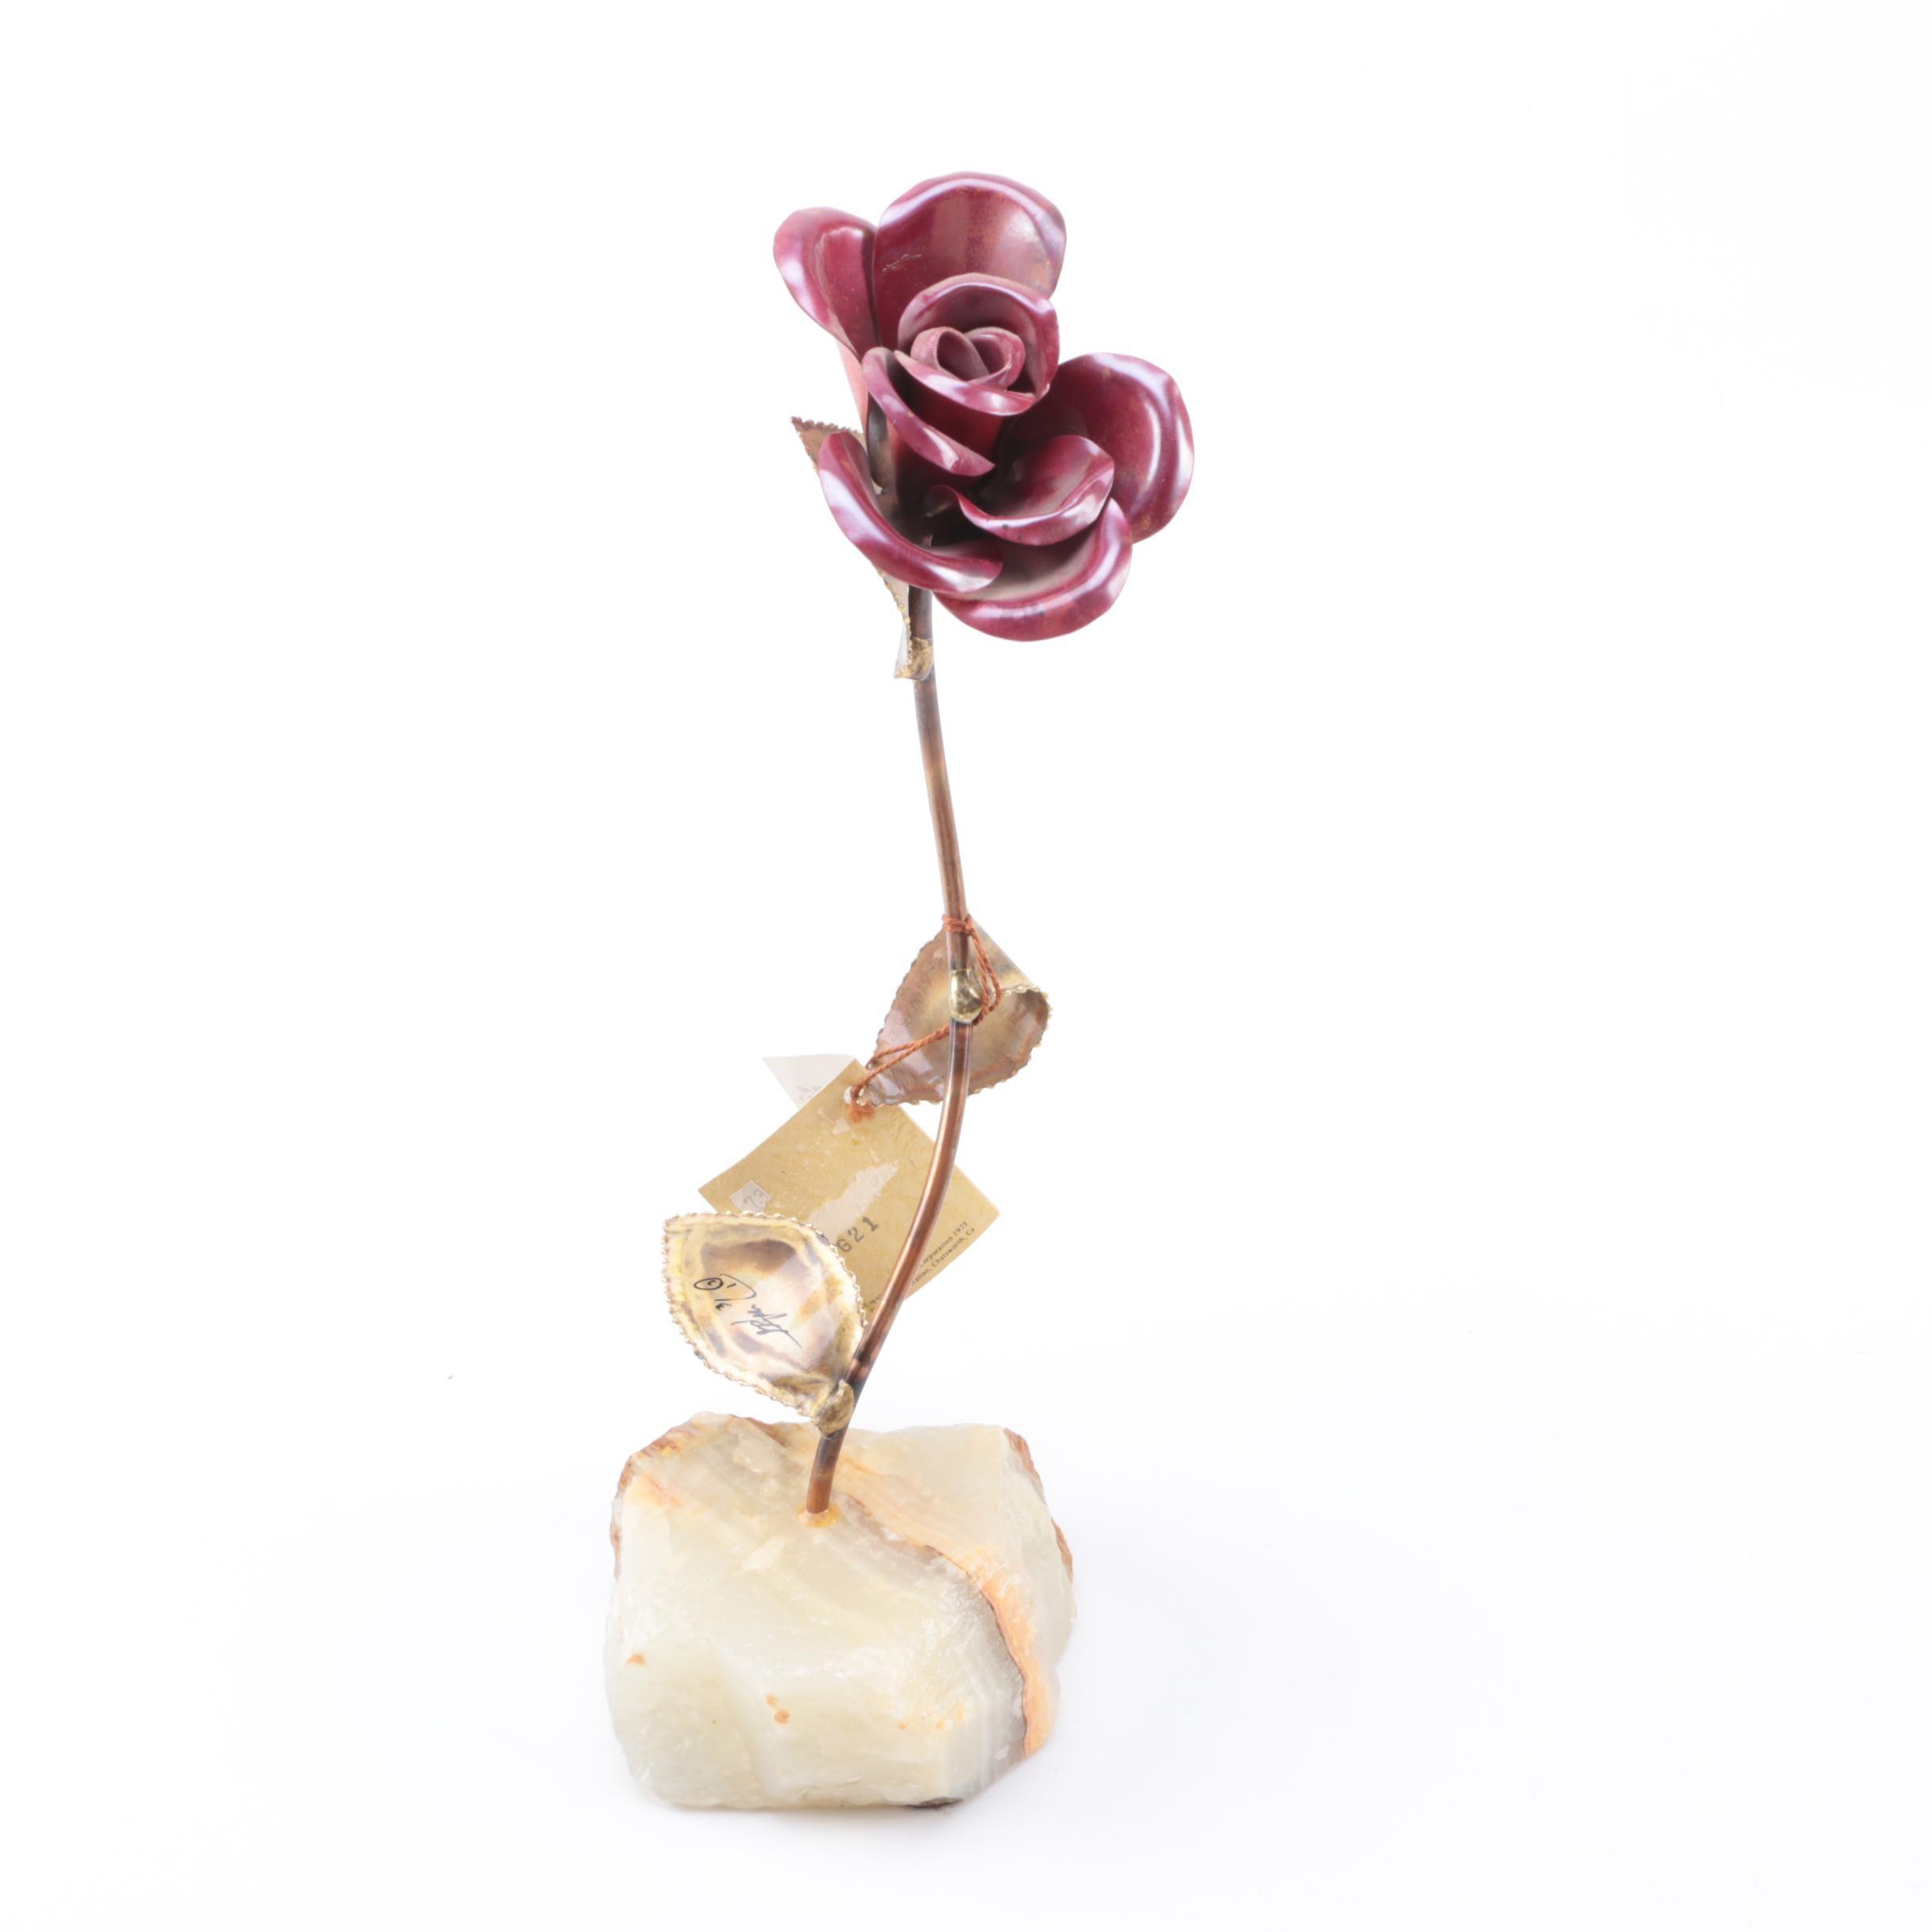 Metal Flower on Agate Base Figurine by DeMott